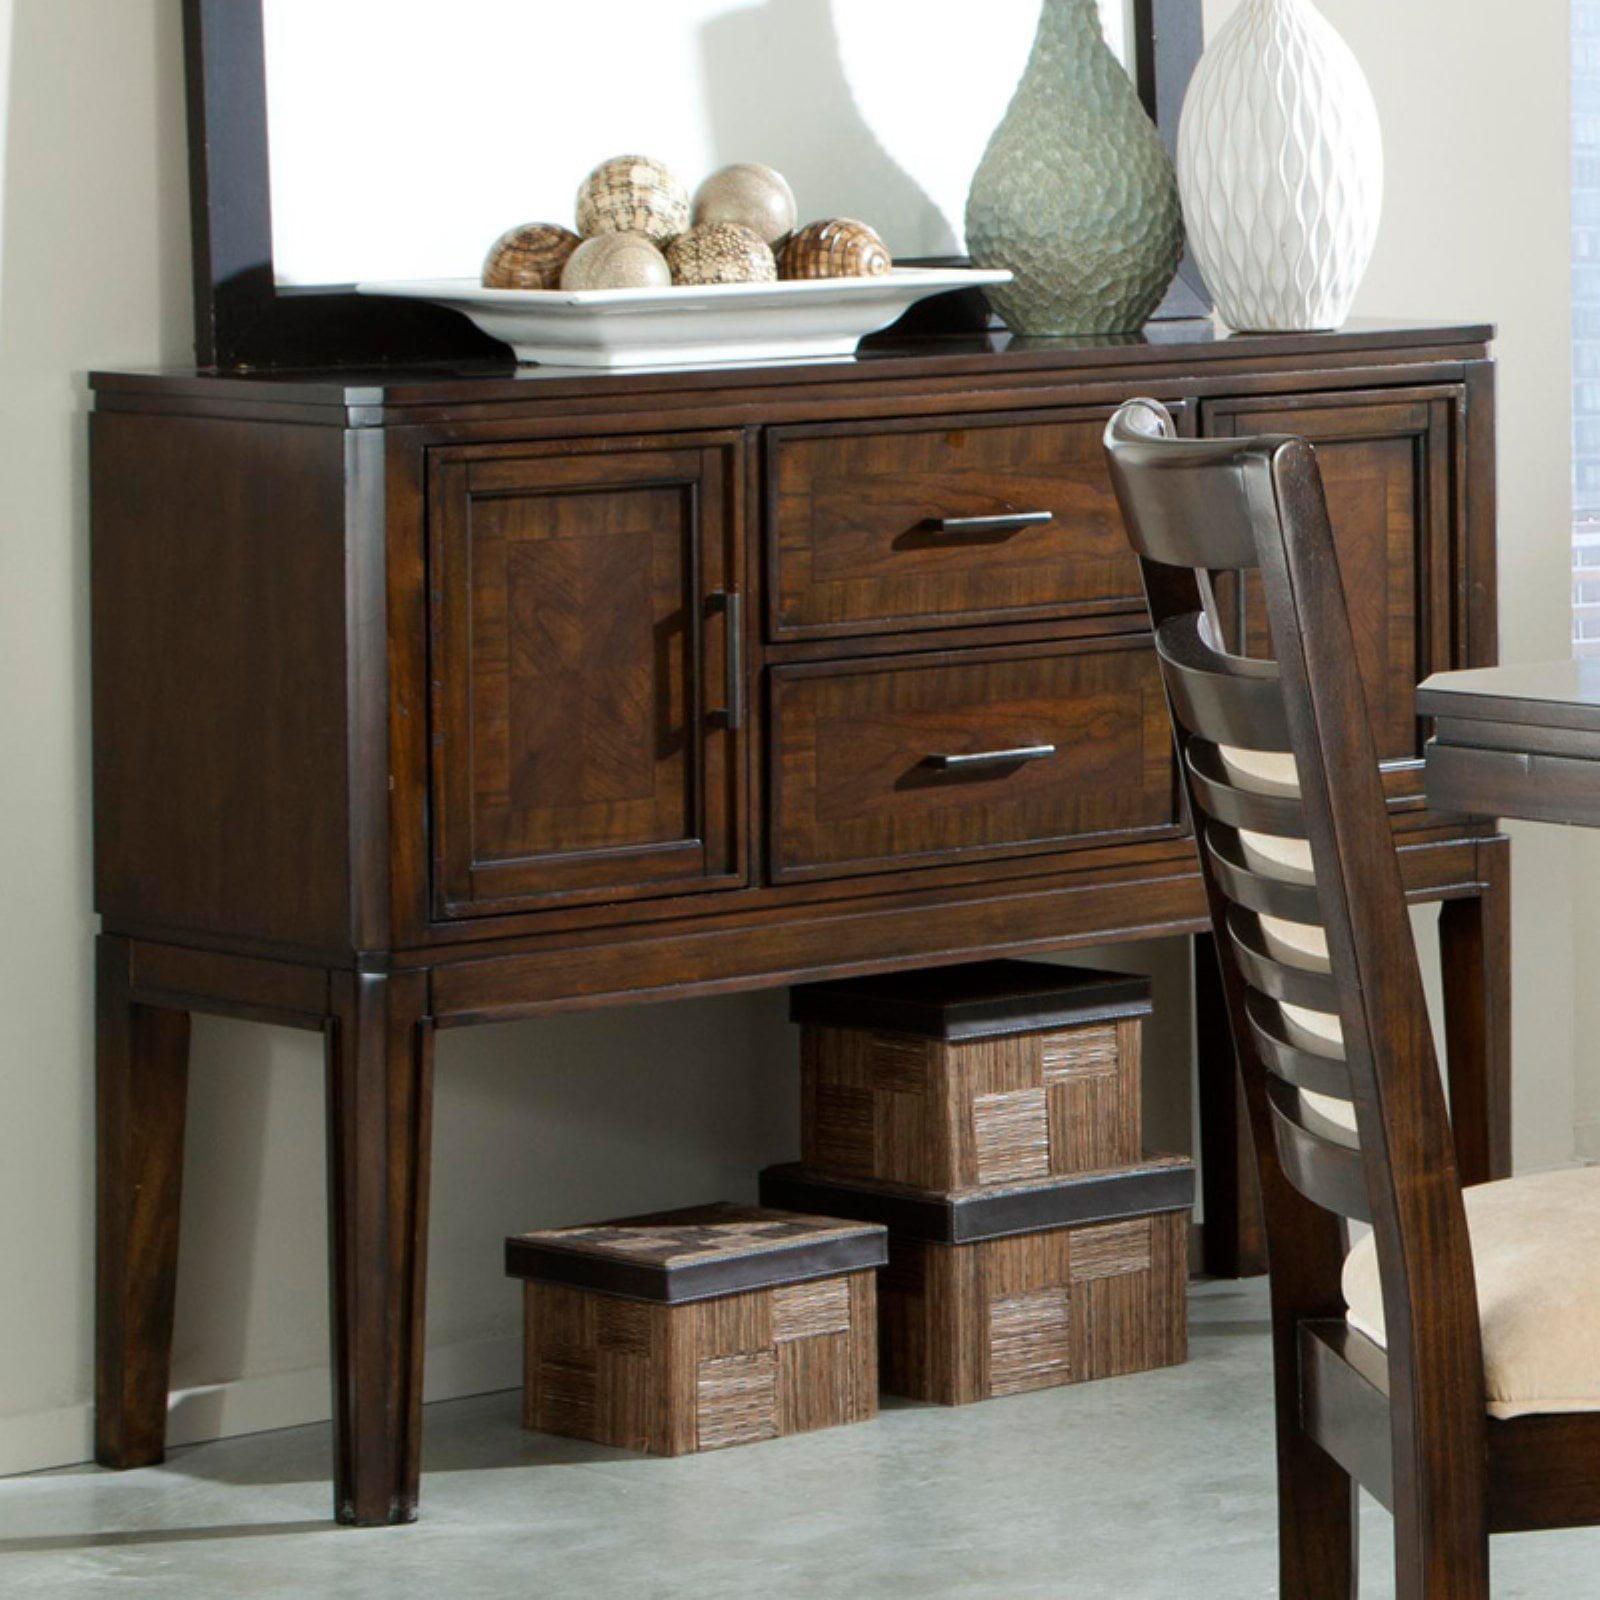 Standard Furniture Avion Dining Sideboard - Walnut